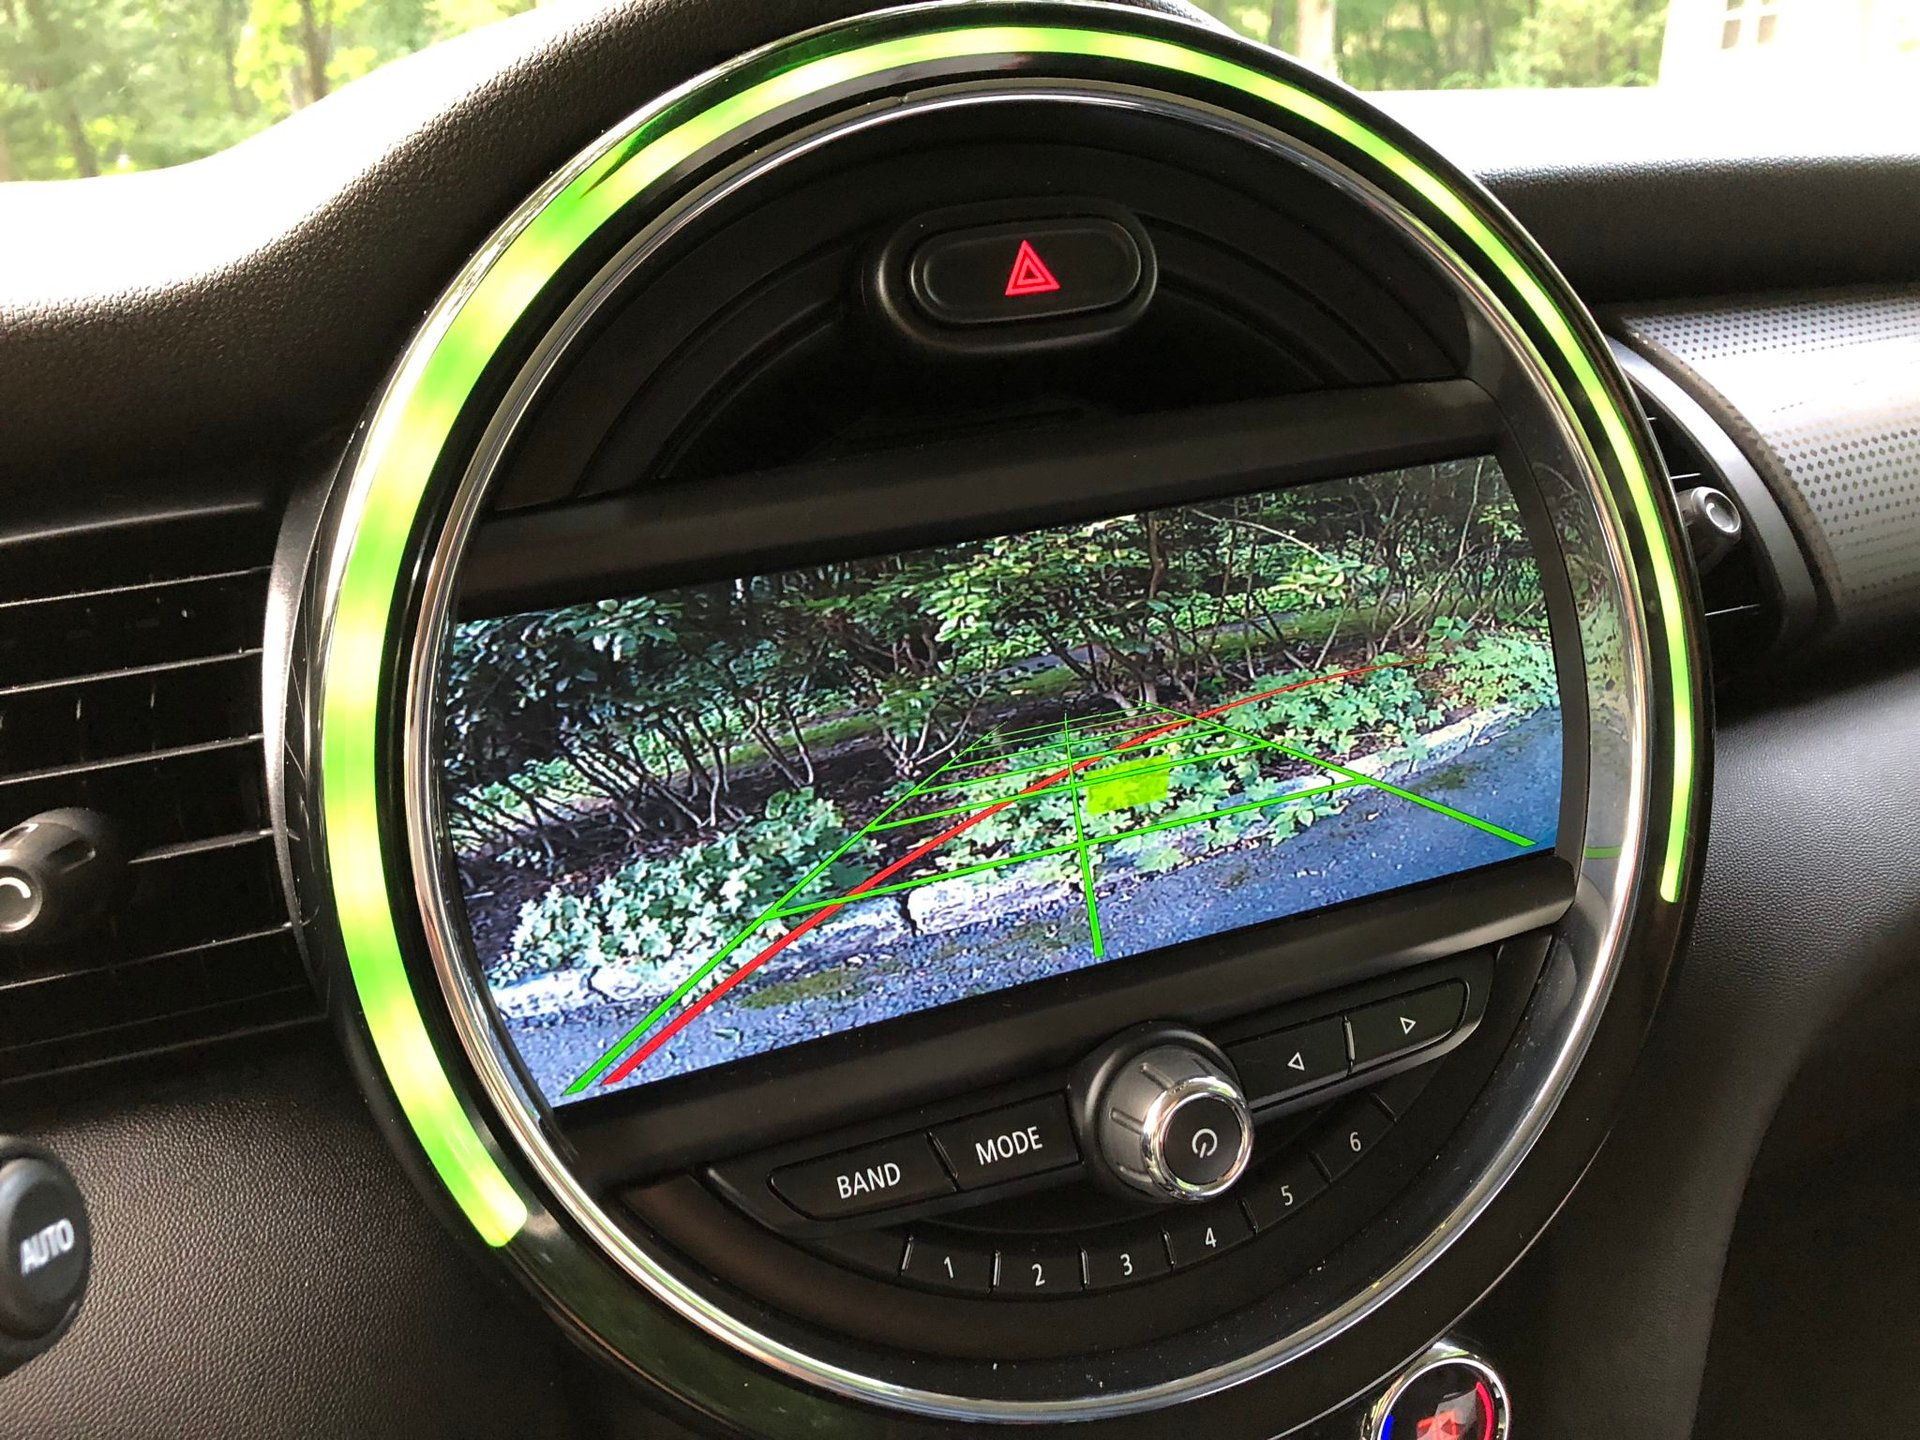 BimmerTech MMI rear view backup camera retrofit for 2015